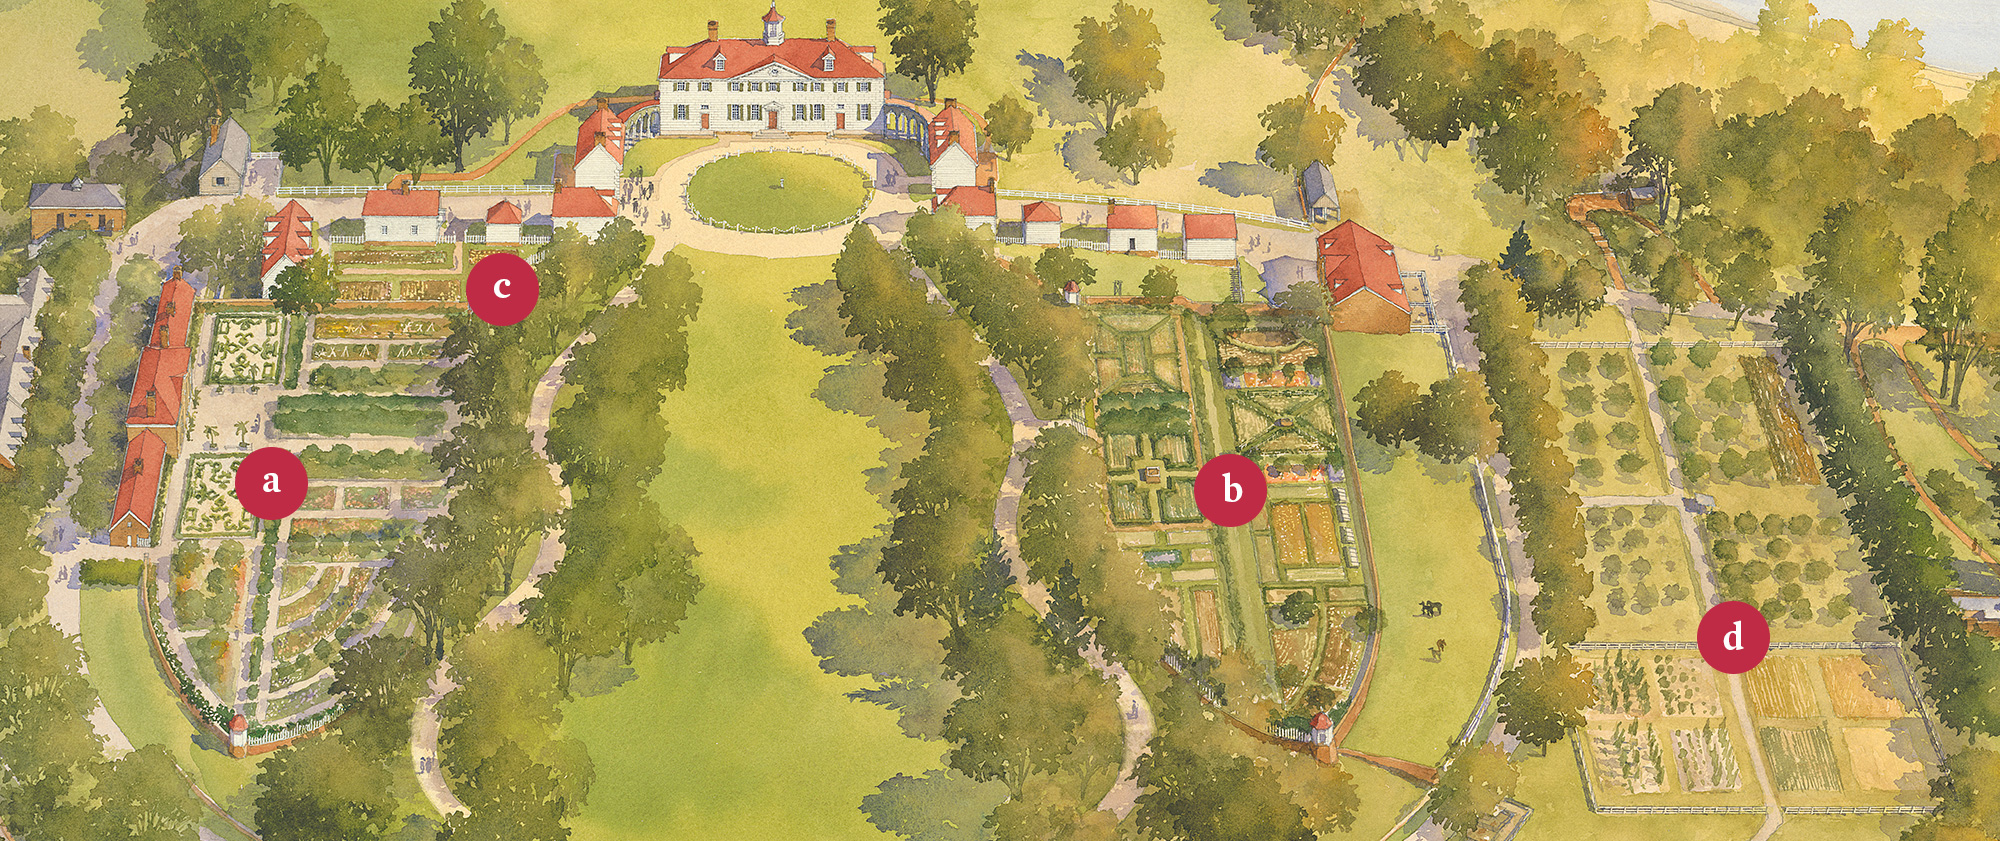 Layout Kitchen Design The Four Gardens At Mount Vernon 183 George Washington S